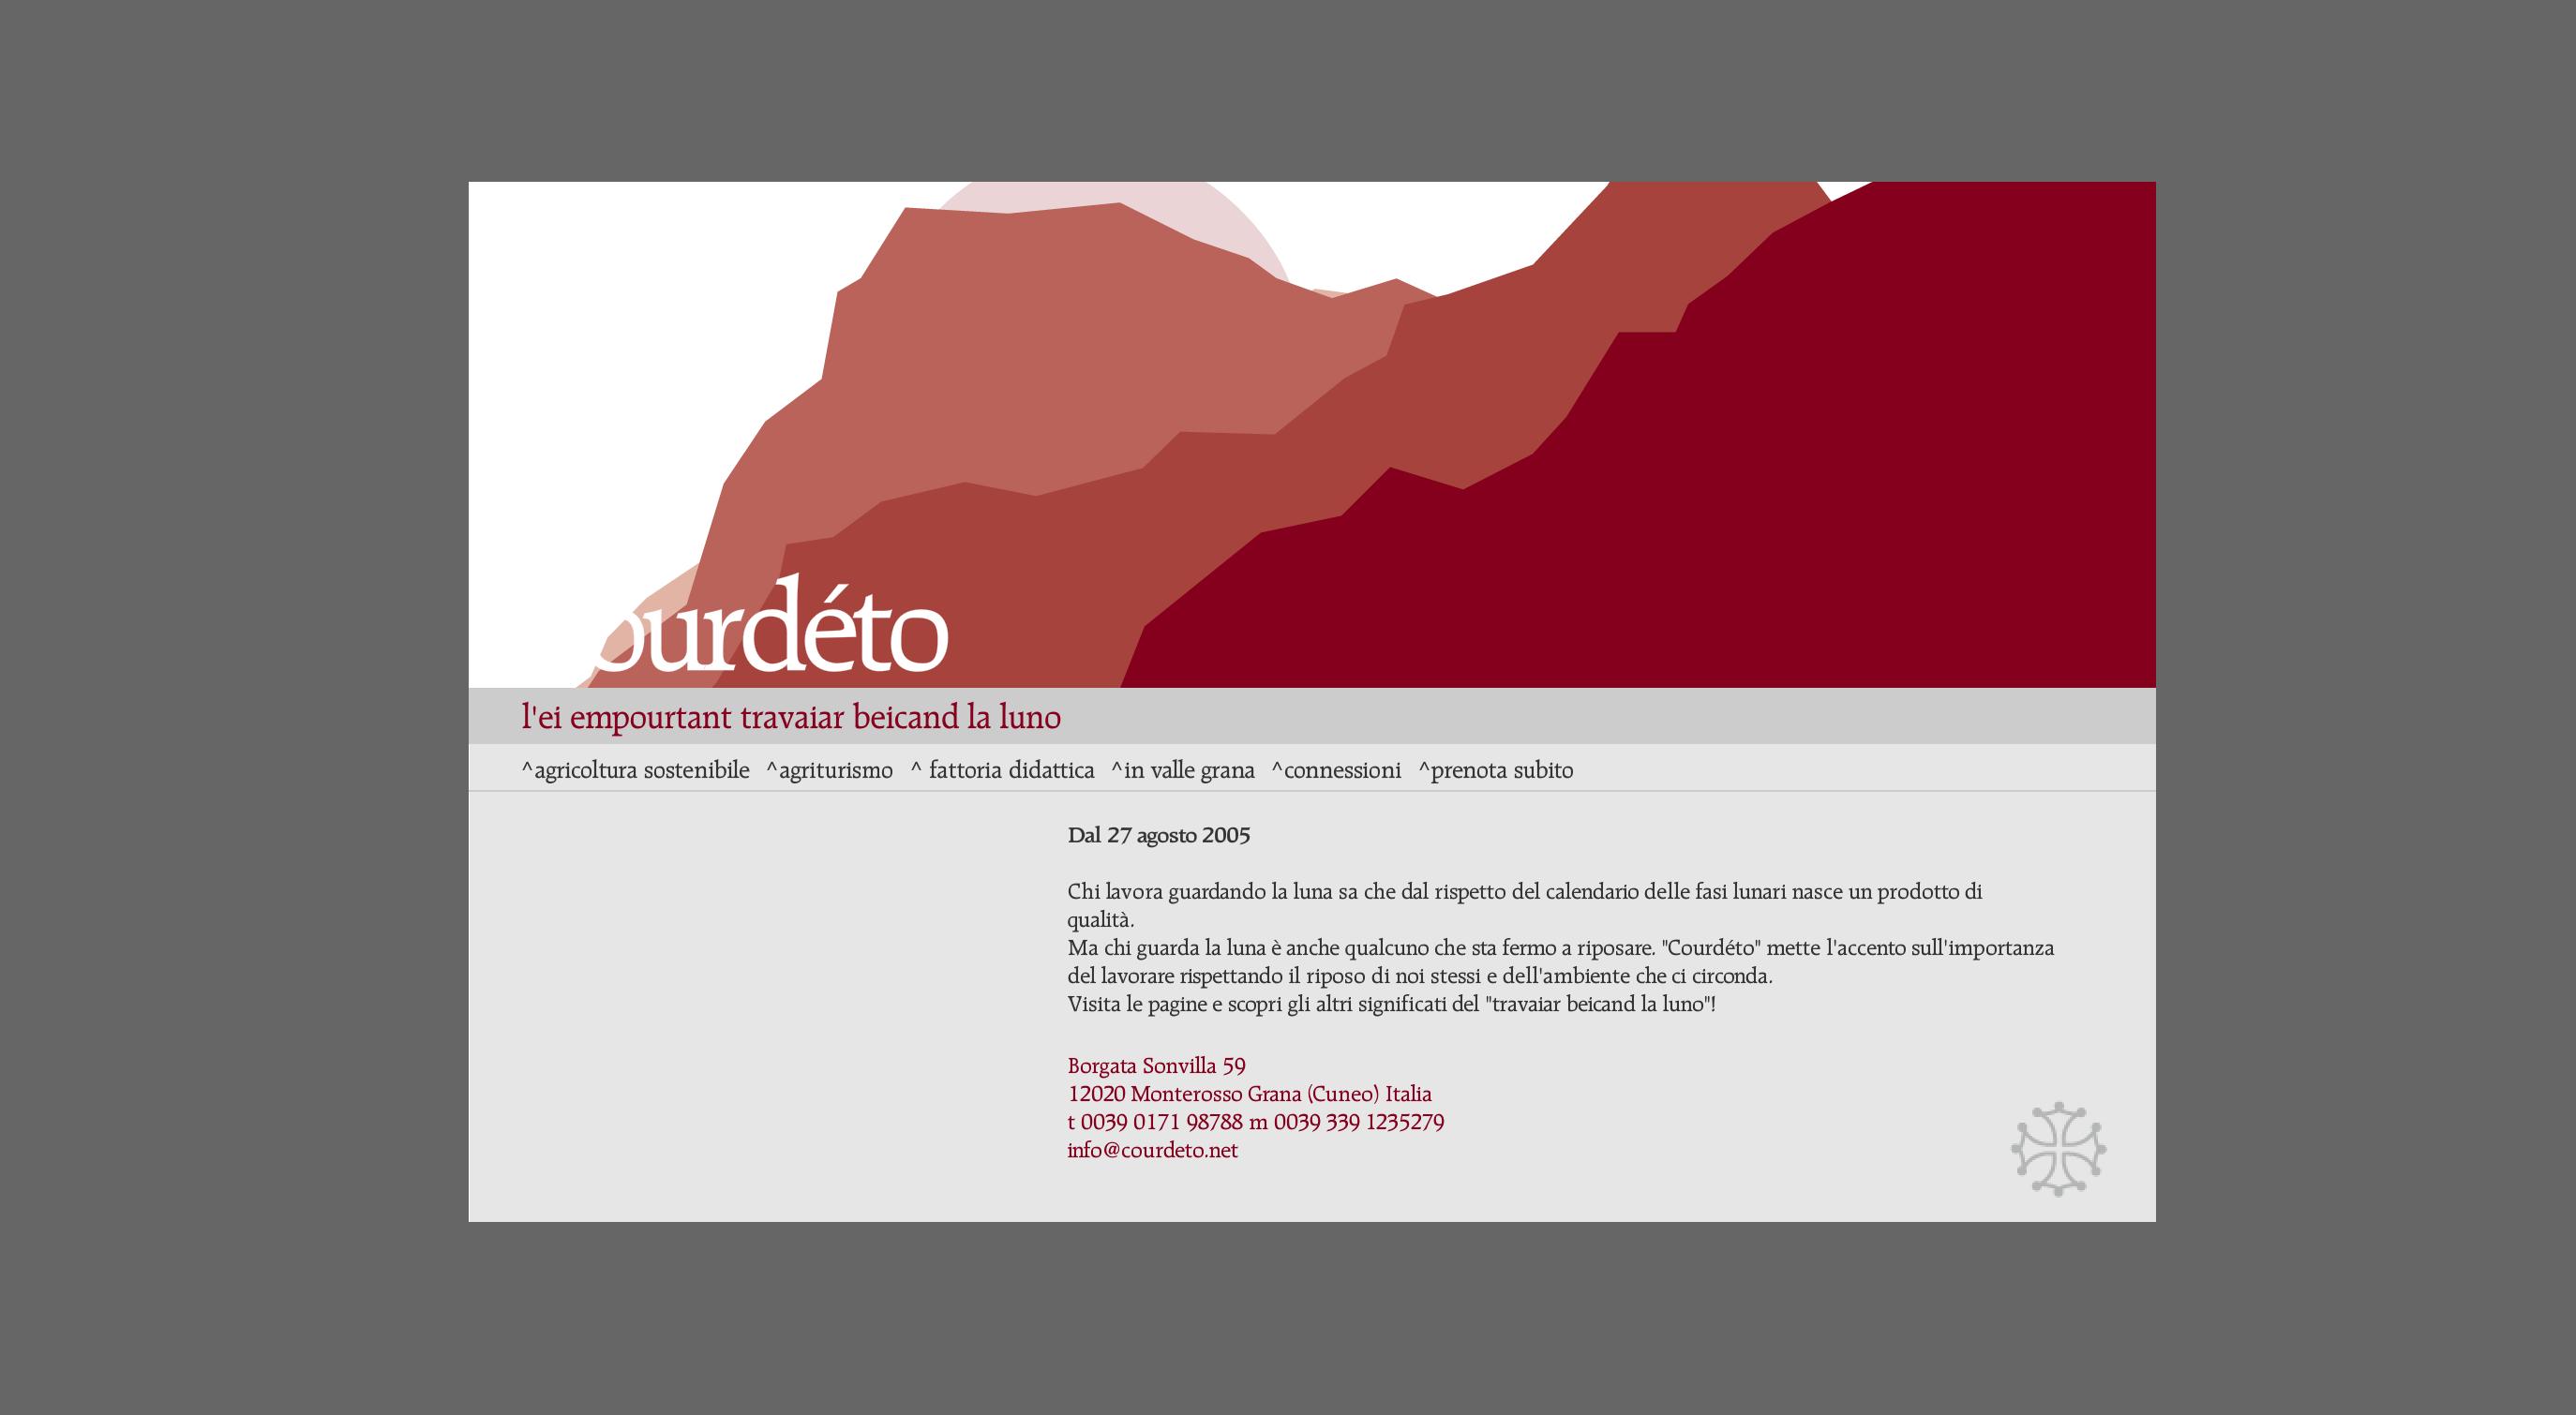 courdeto1